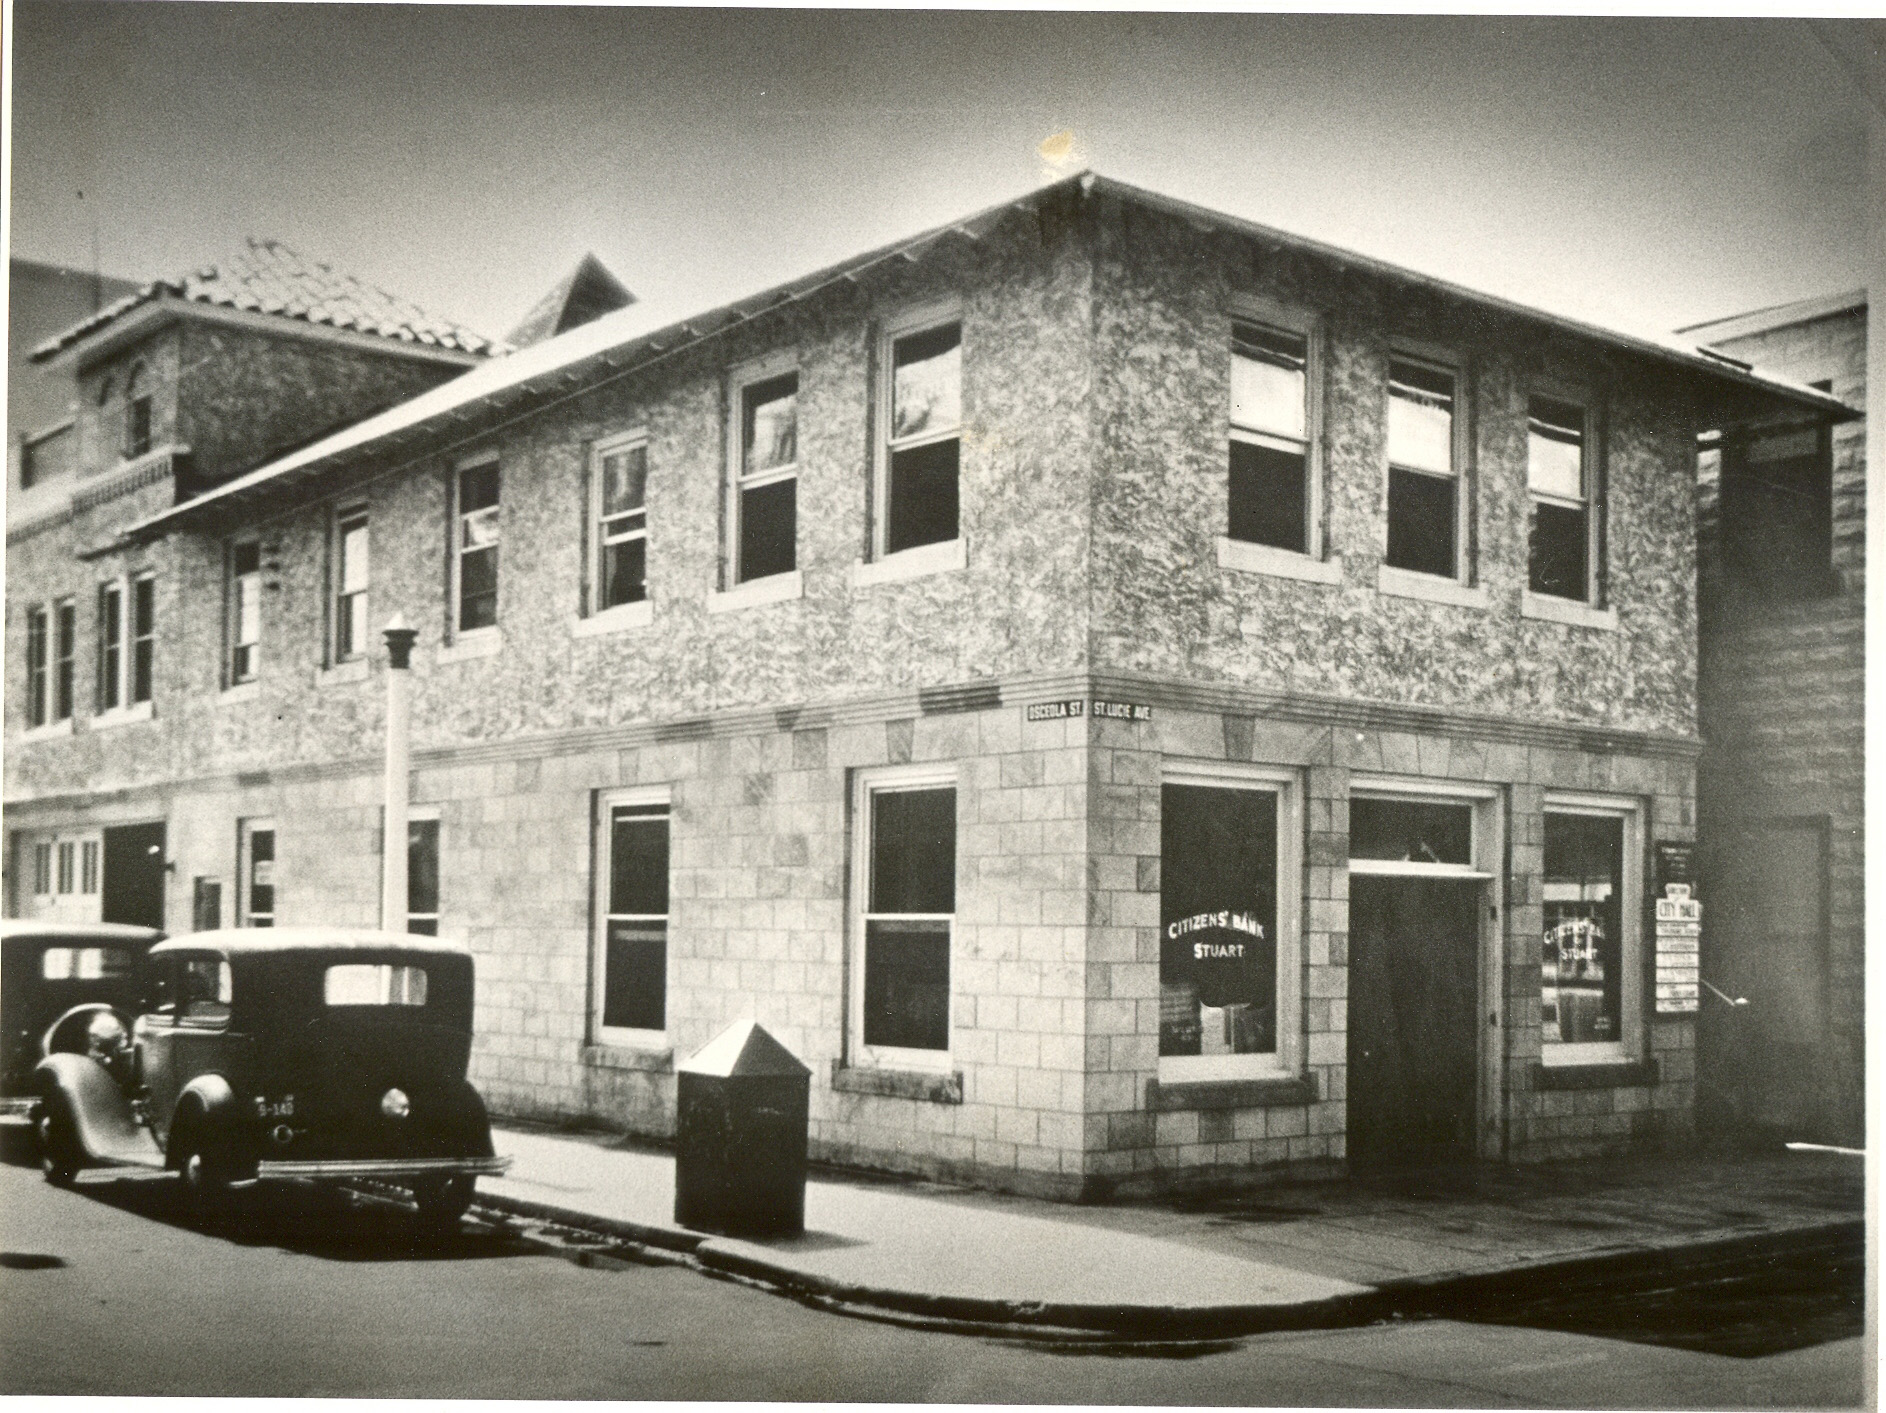 CitizensBankOfStuart_1933R(Site now Fellowship Hall)--seacoast history copy